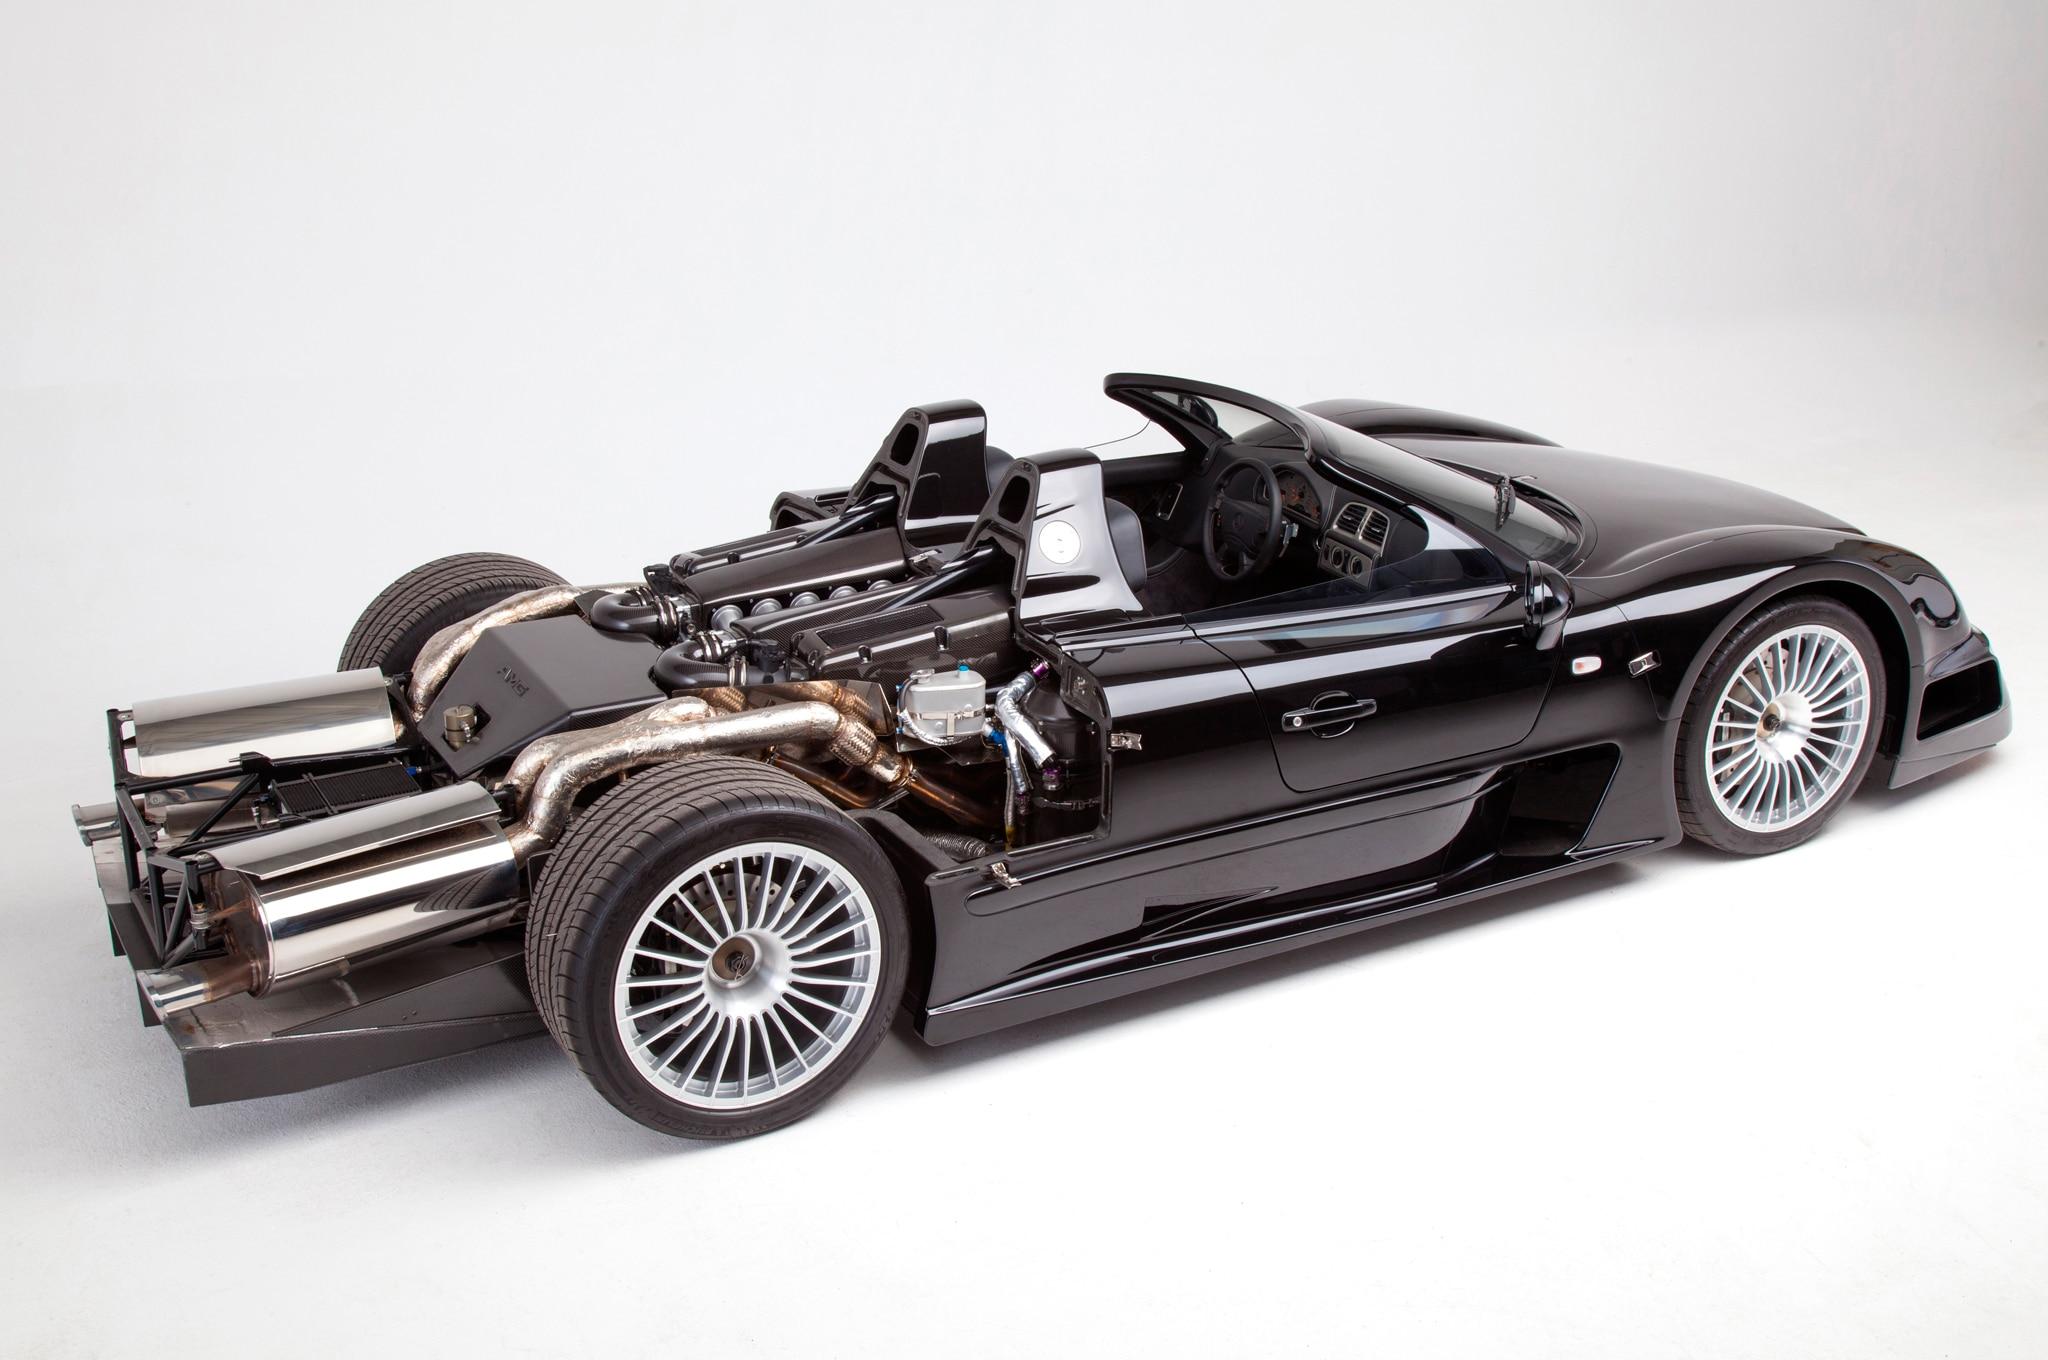 Mercedes Clk Gtr Roadster Specs